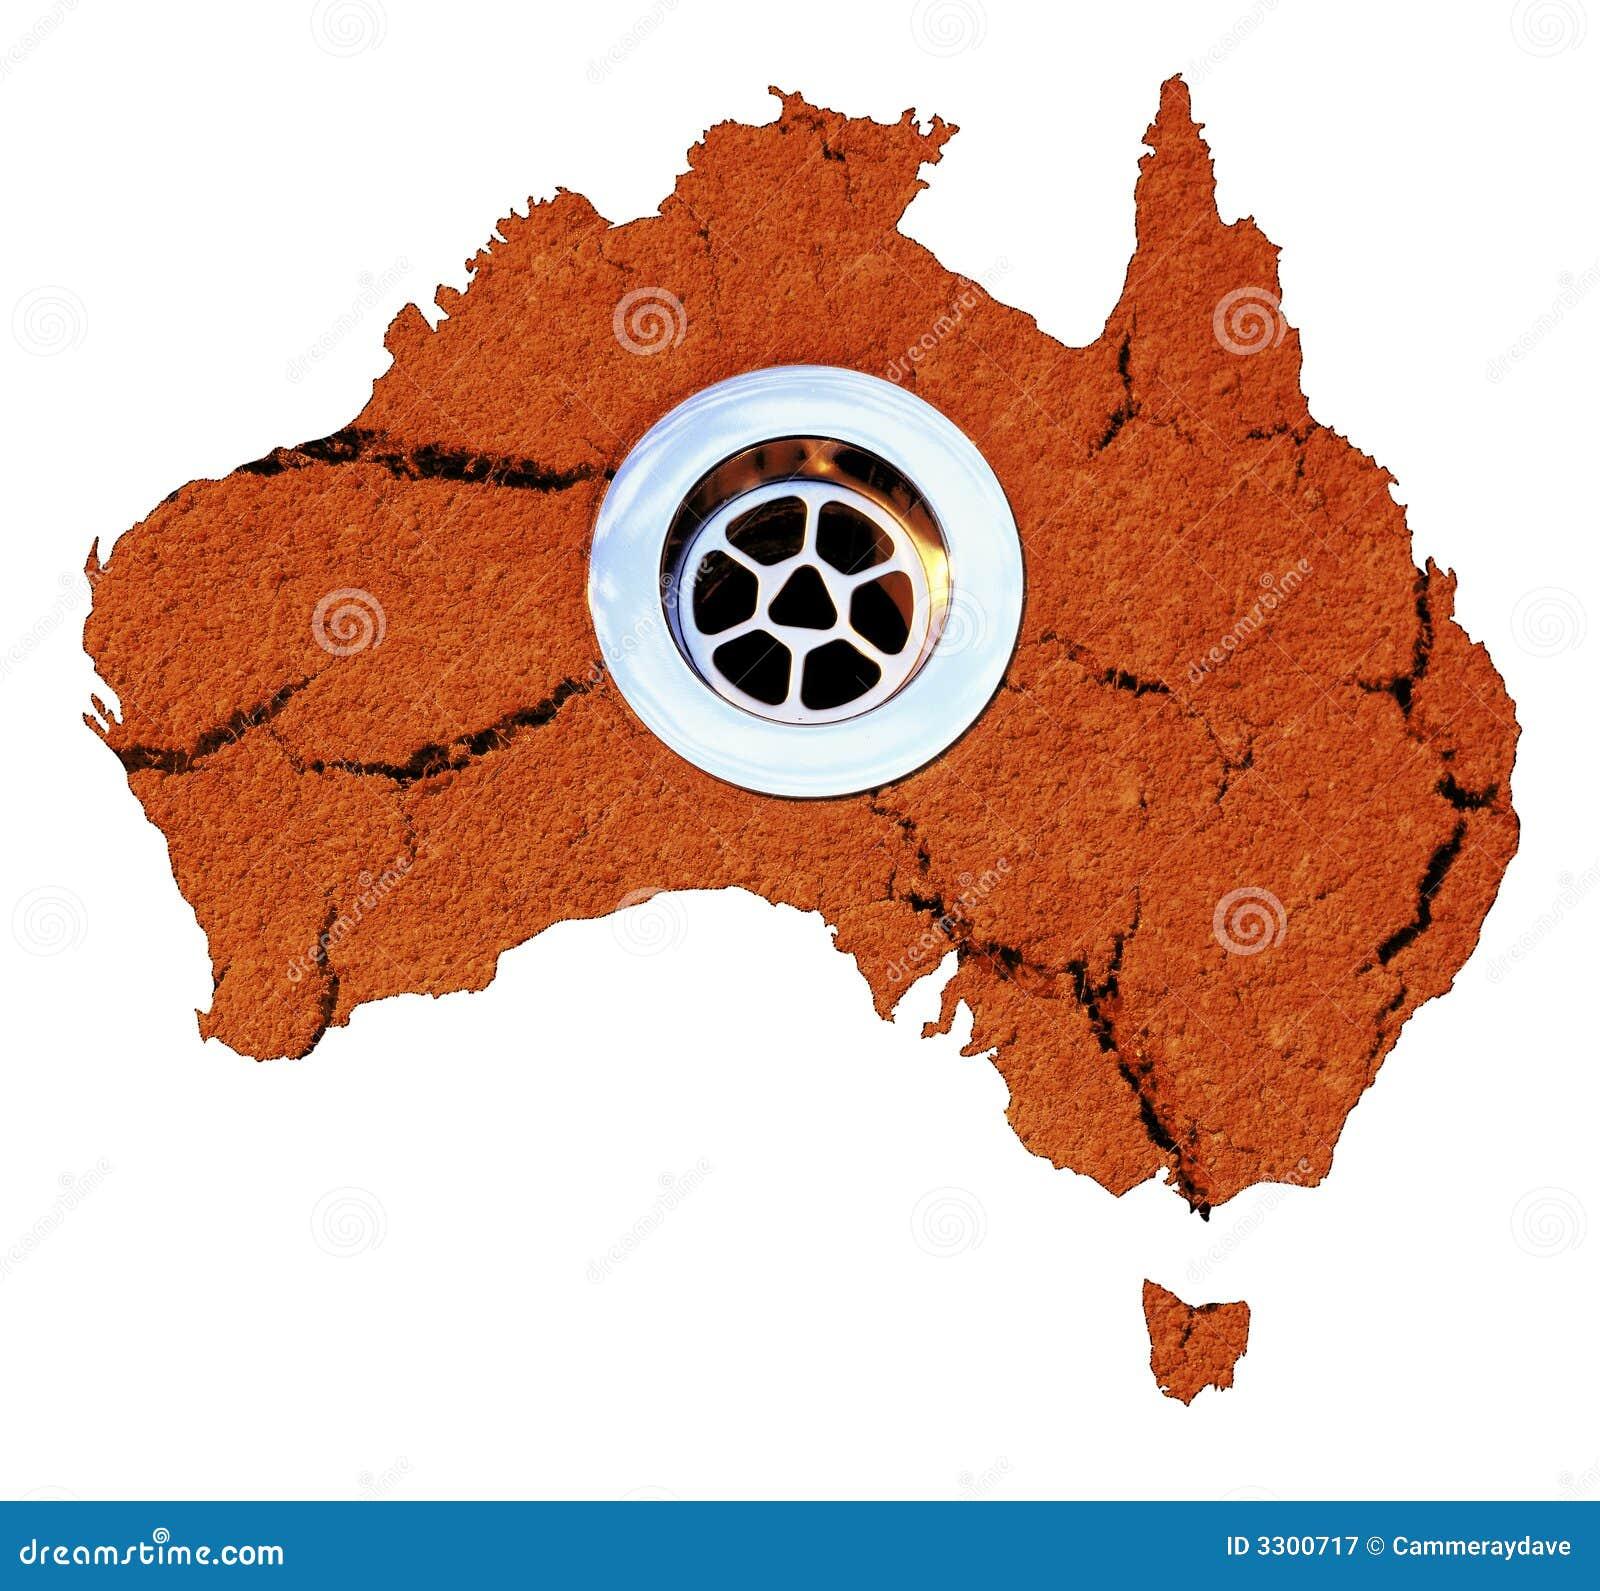 Australia Drought Water Drain